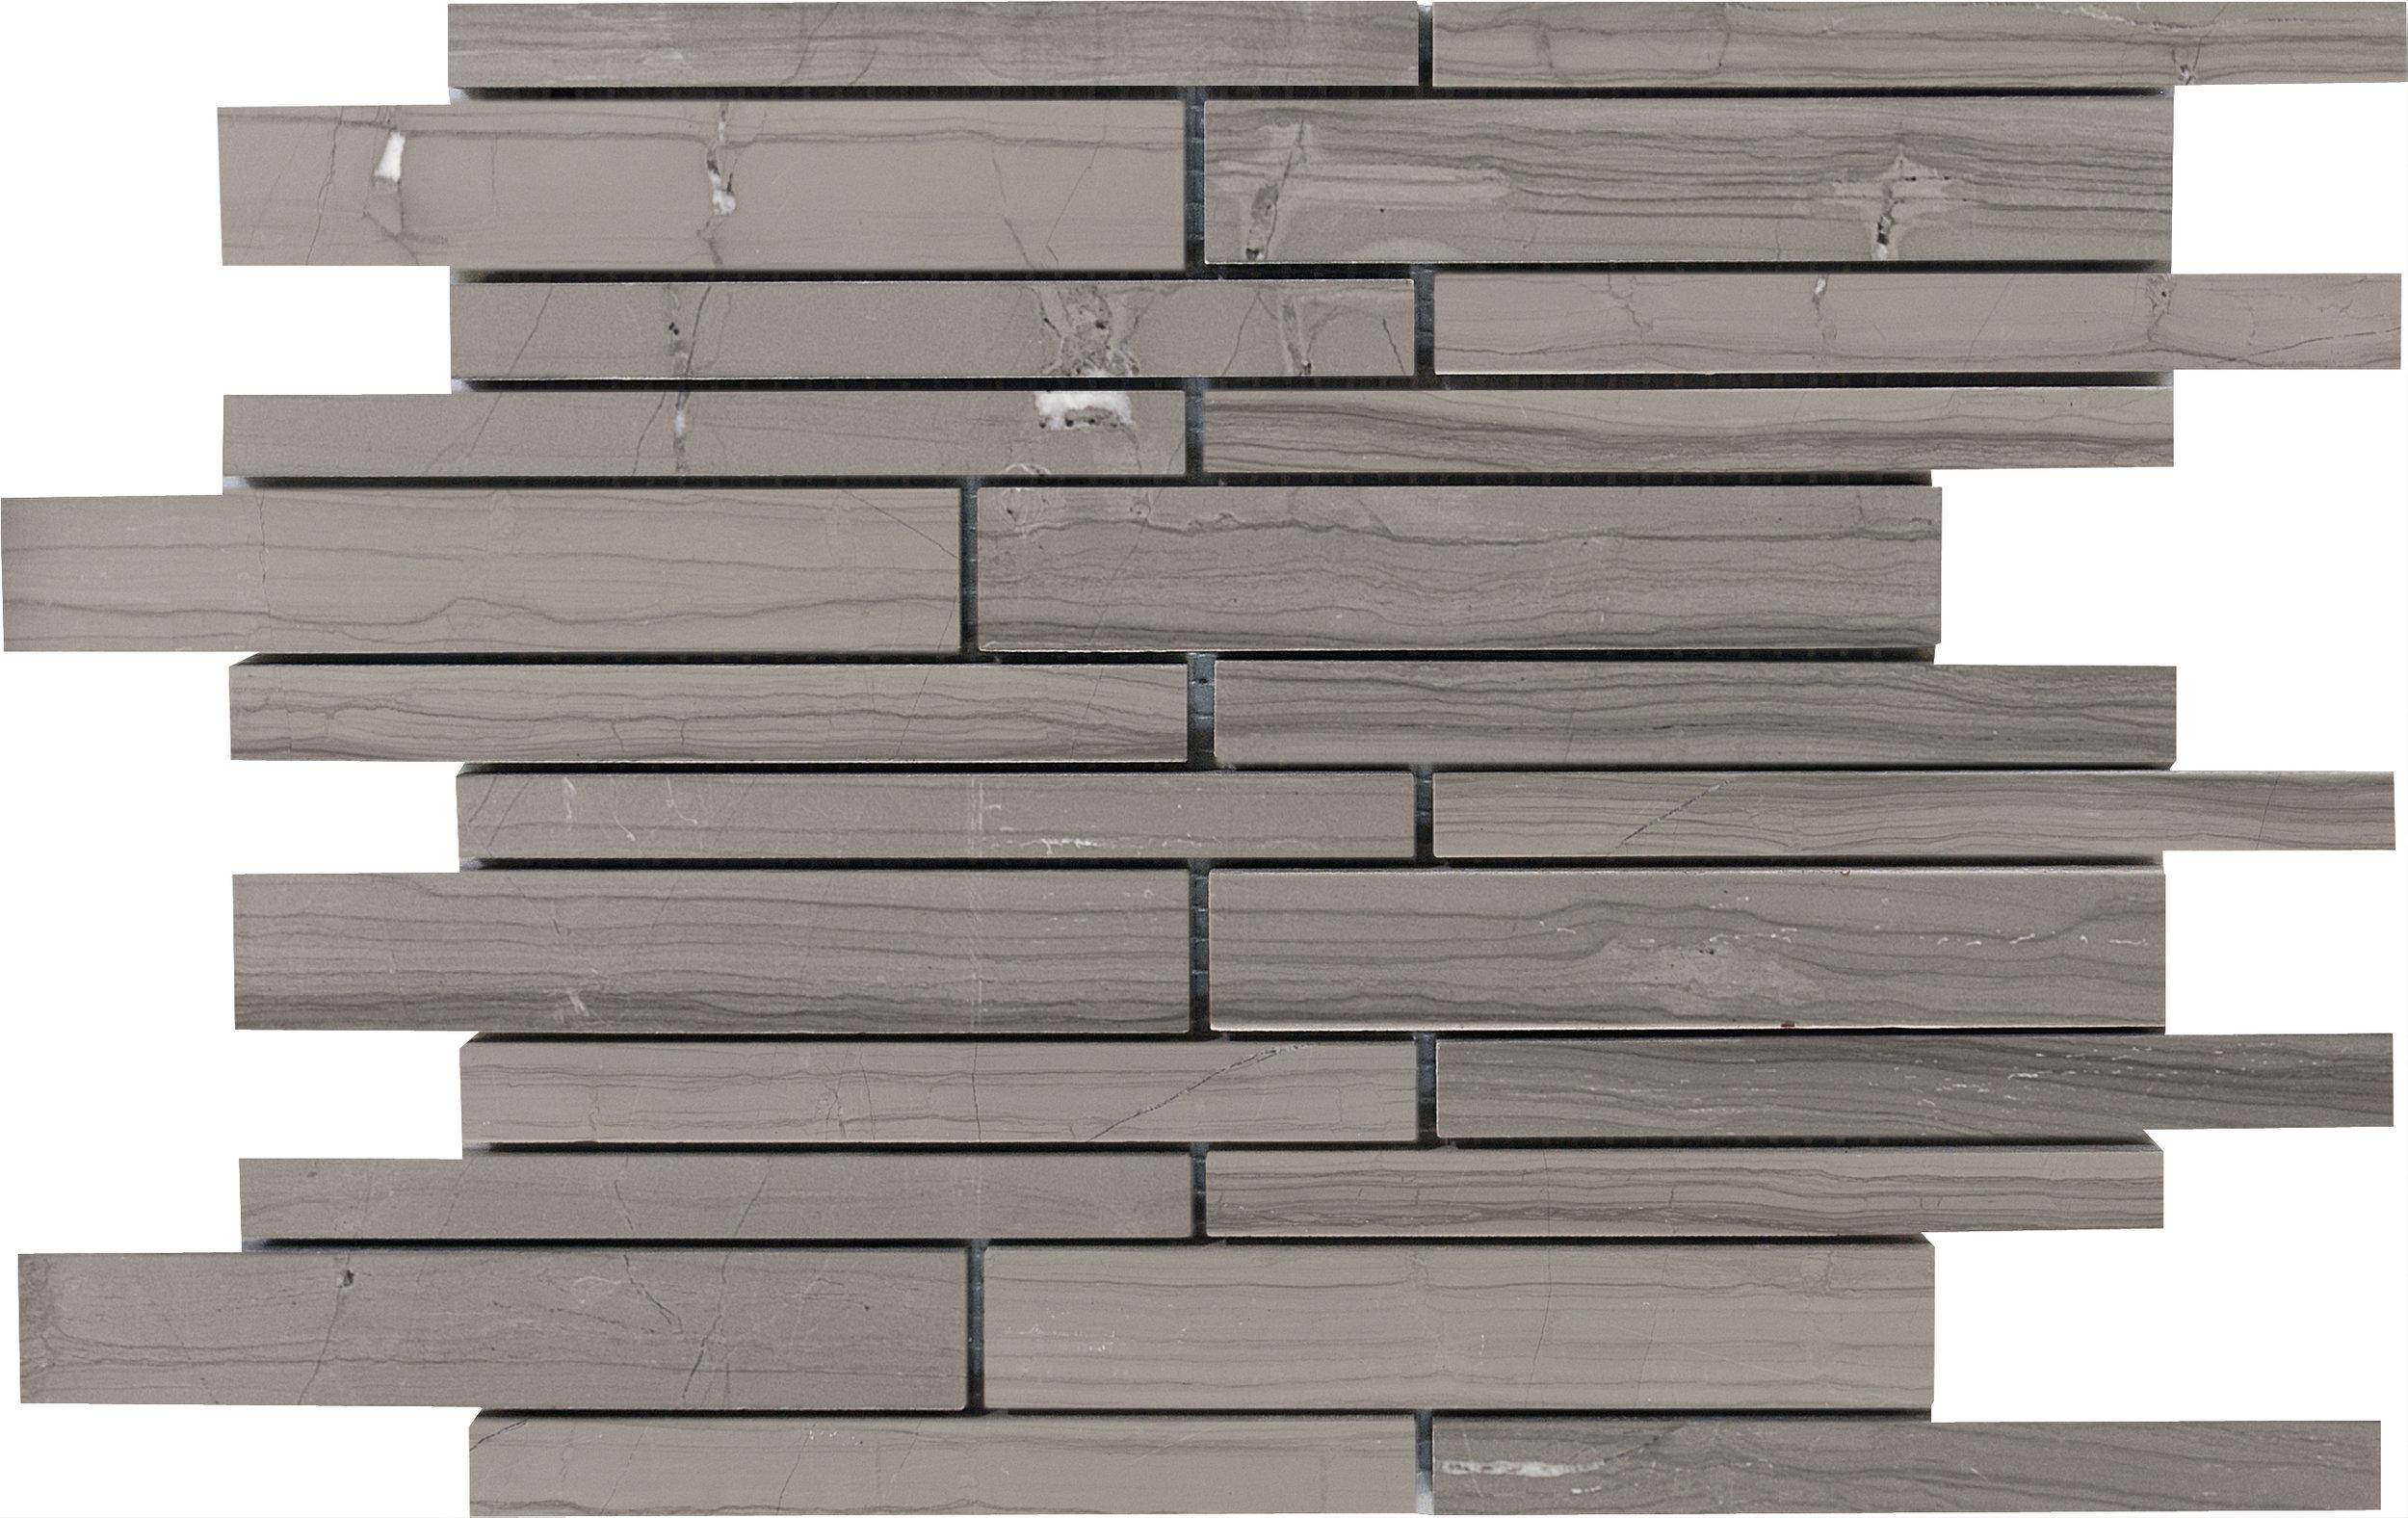 "MS90101 haisa dark honed staggered mosaic 9""x12""x3/8"" sheets"